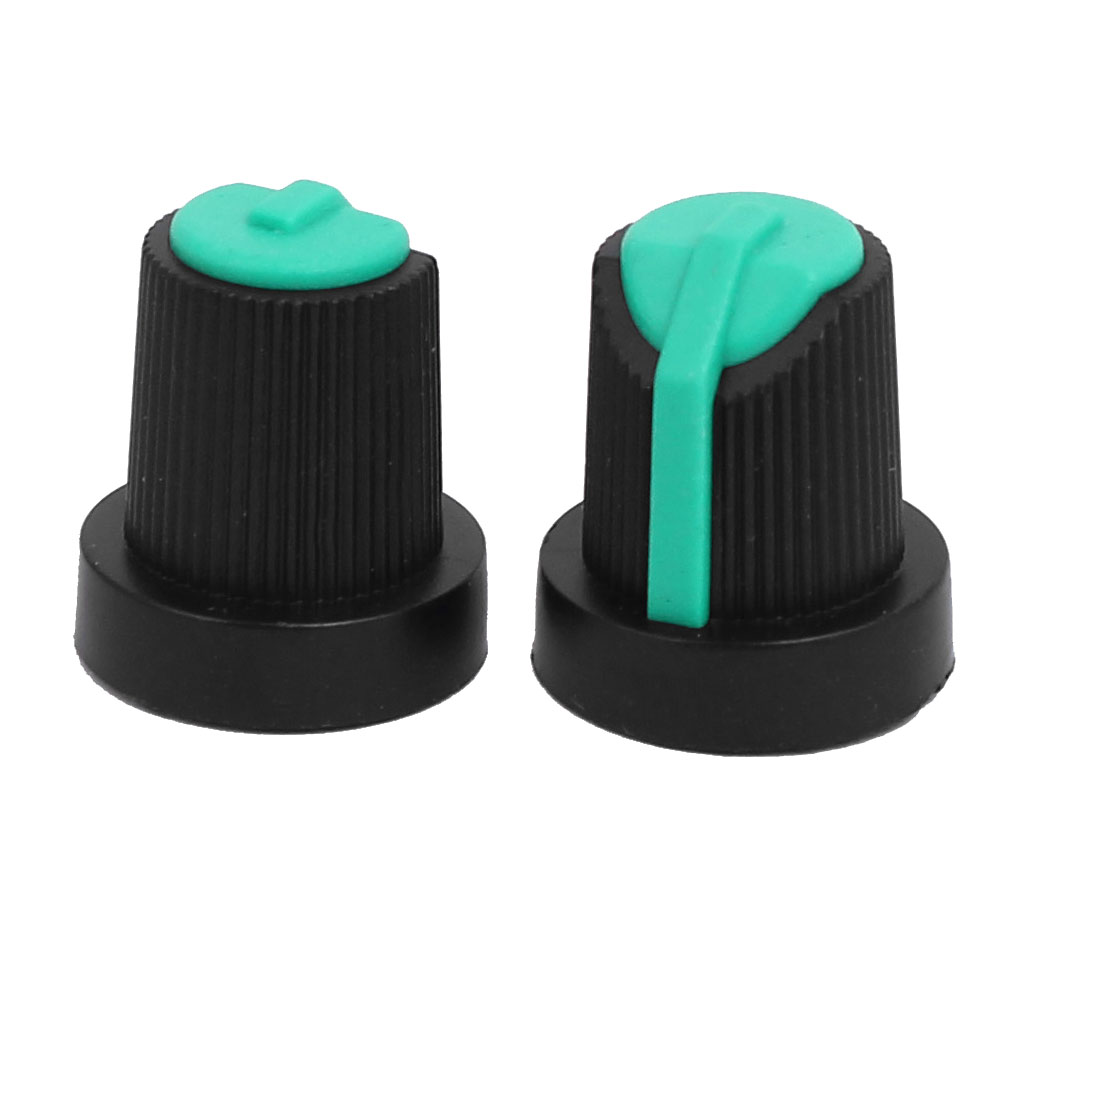 6mm Shaft Hole Dia Potentiometer Pot Knobs Caps Green Black 50 Pcs - image 1 of 3